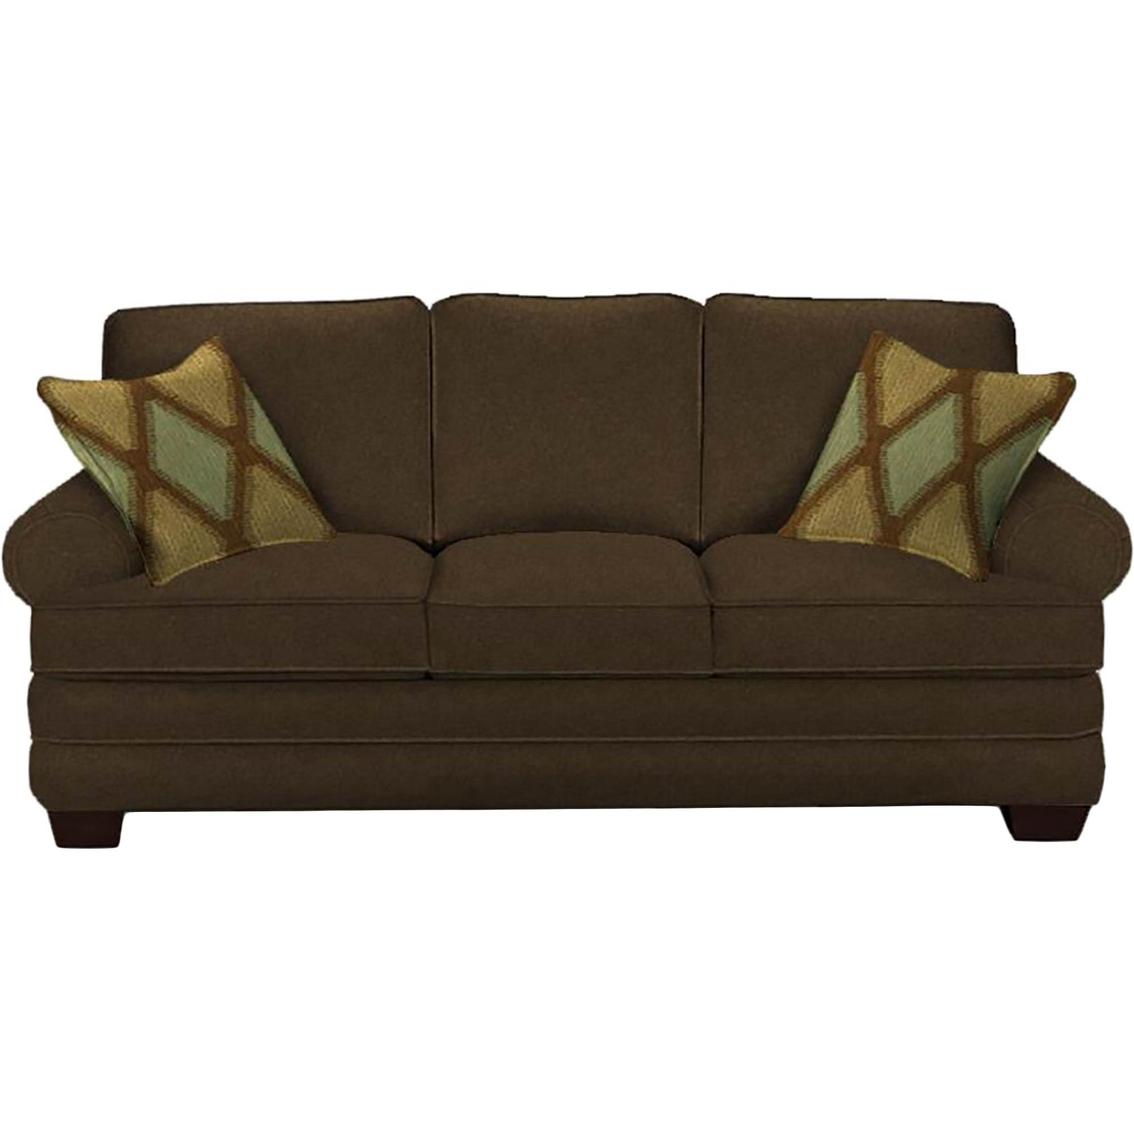 - Hgtv Home Design Studio By Bassett Sock Arm Queen Sofa Sleeper